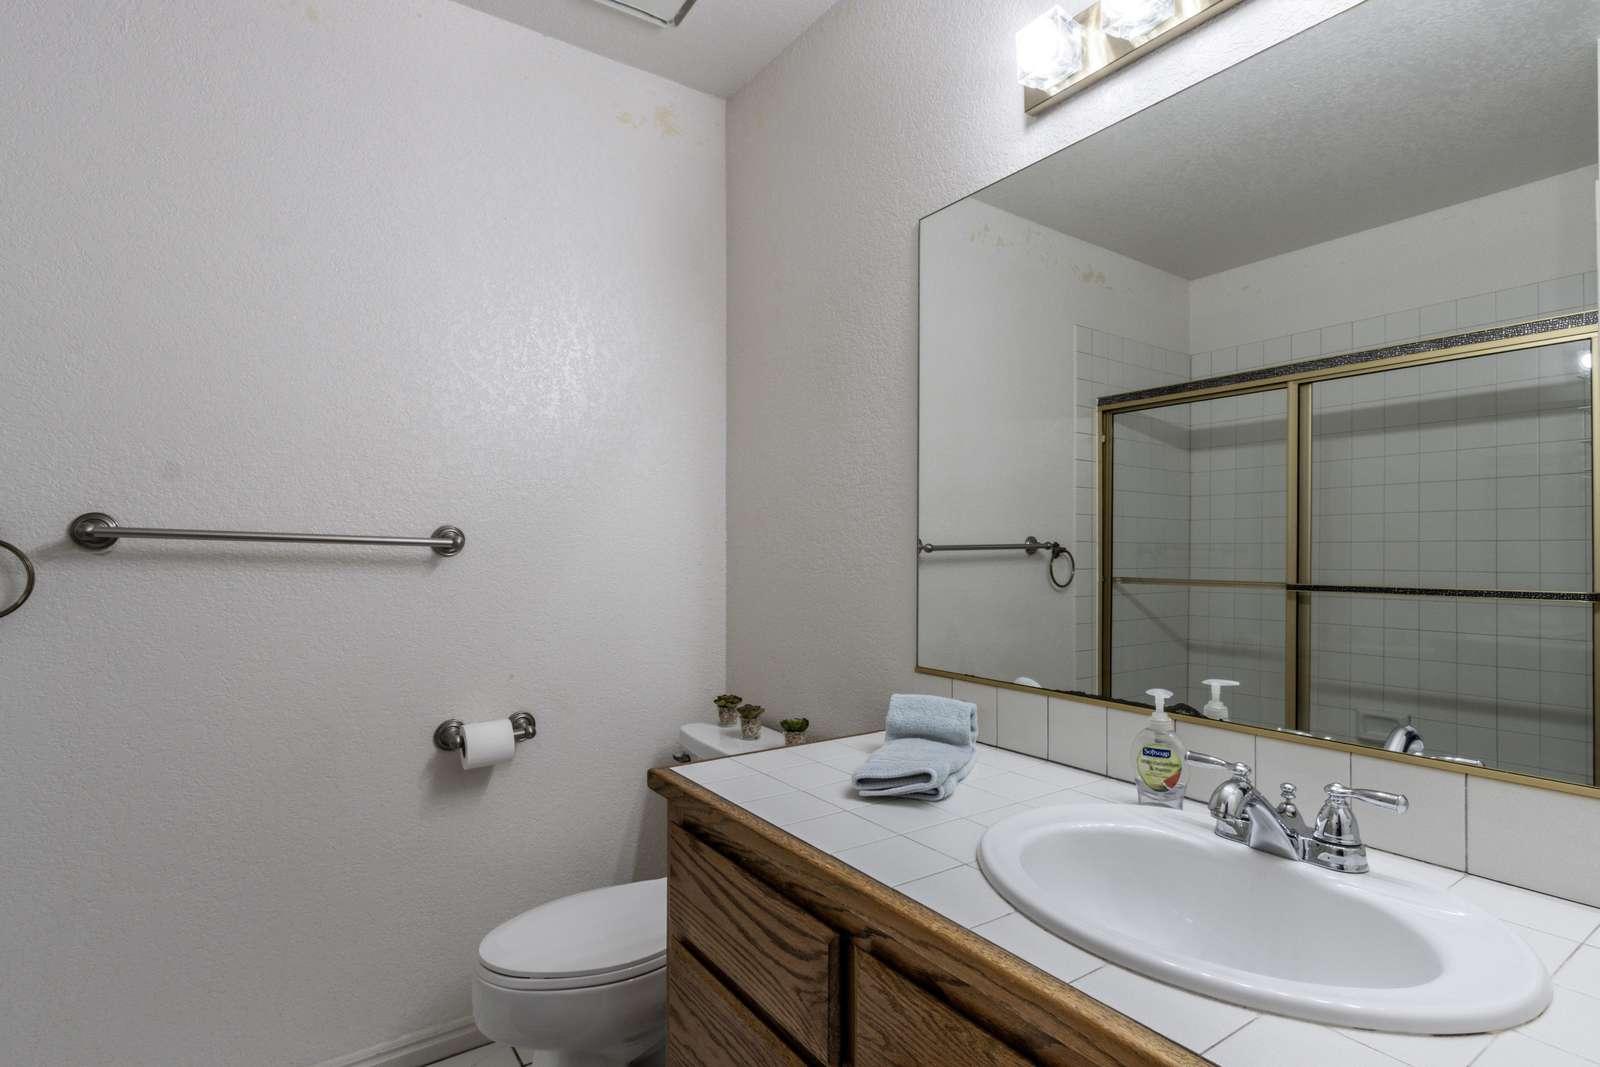 Upstairs bathroom.bath shower